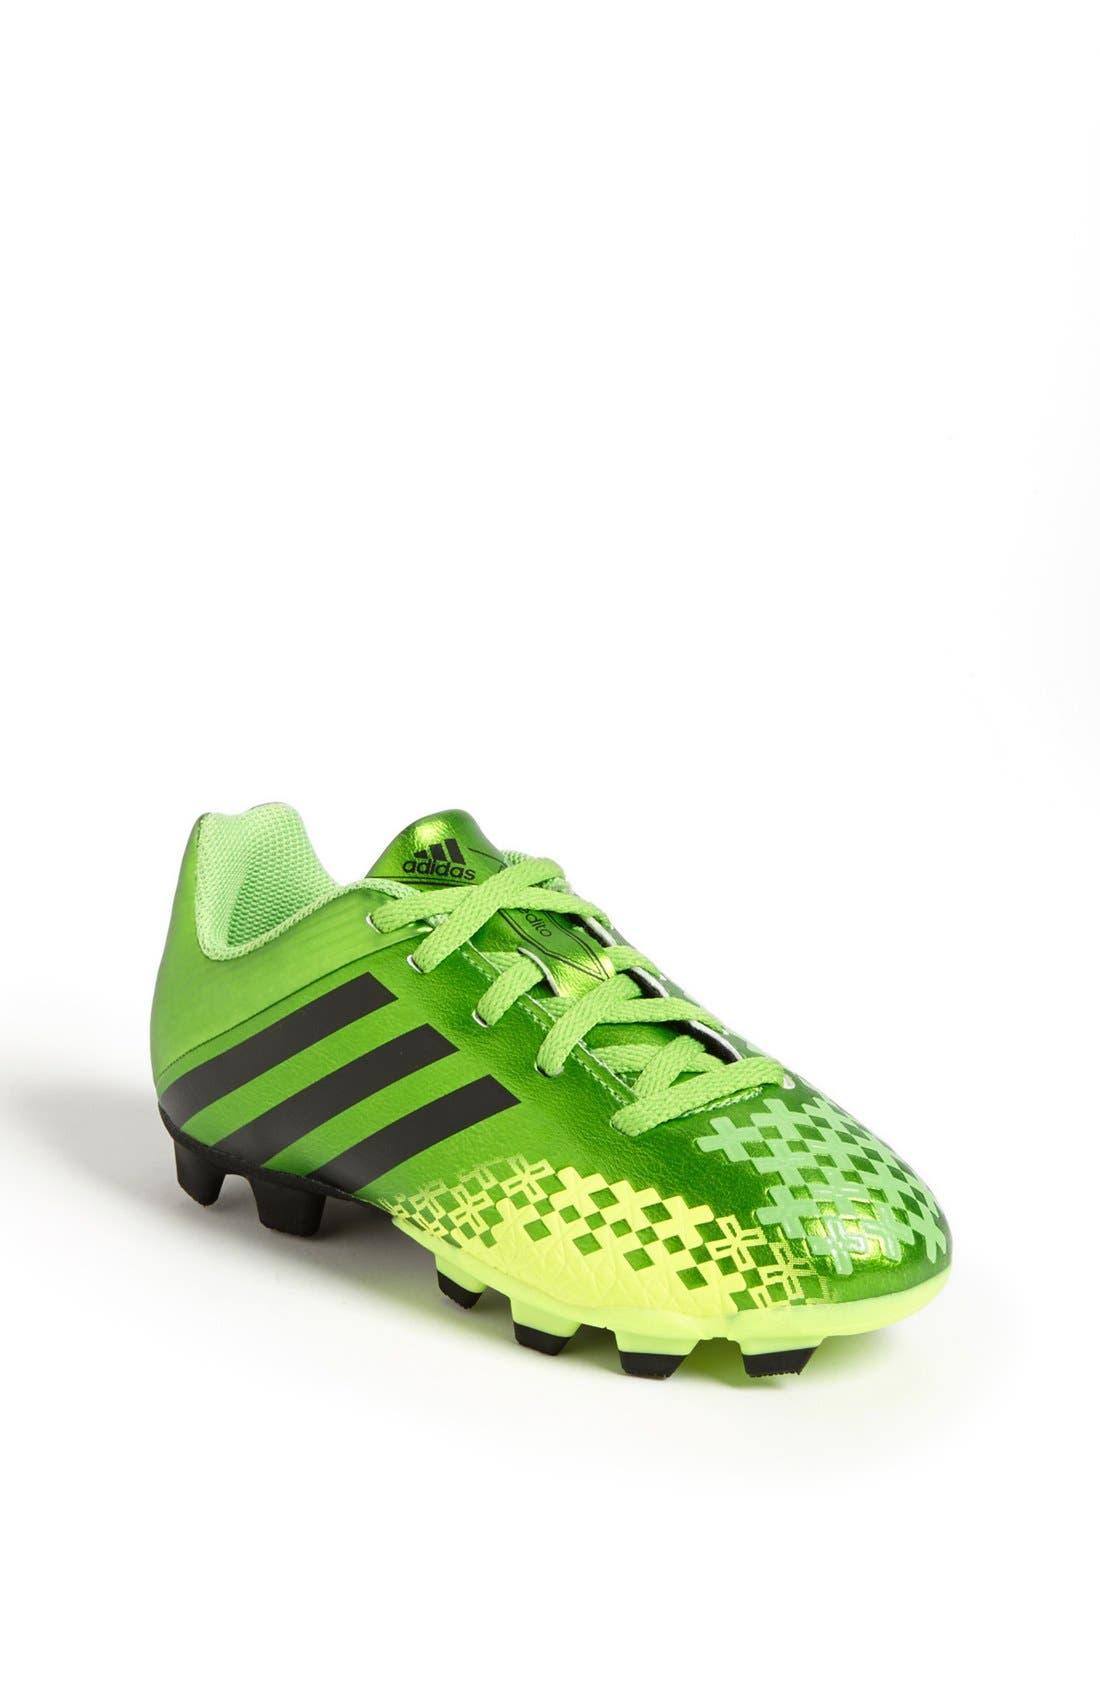 Main Image - adidas 'Predito LZ TRX FG' Soccer Cleat (Toddler, Little Kid & Big Kid)